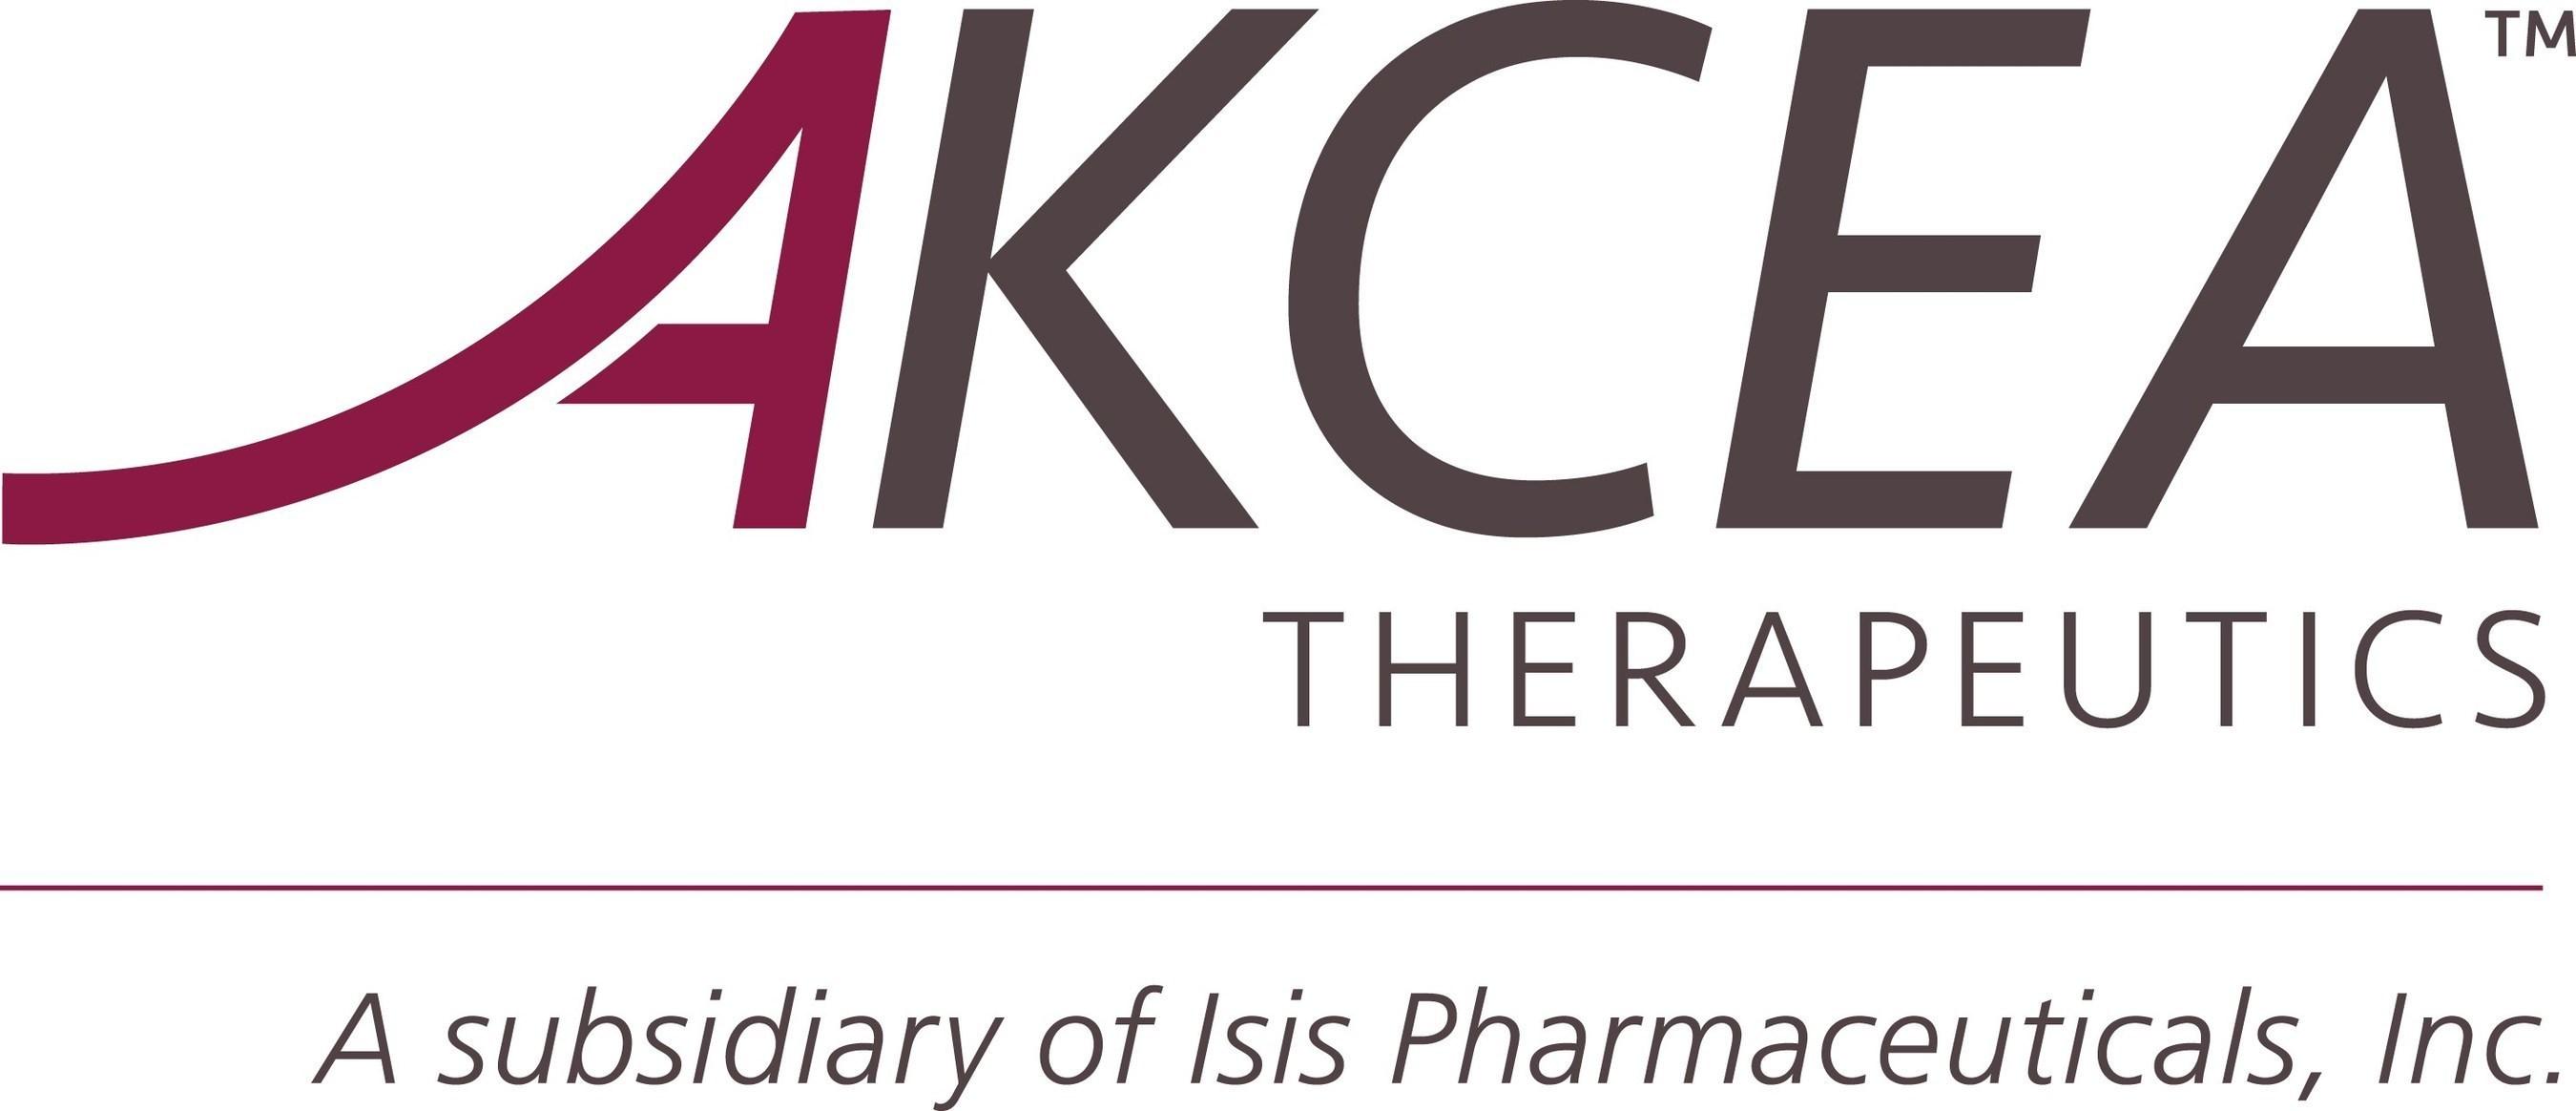 «Аксиа терапьютикс» (Akcea Therapeutics).